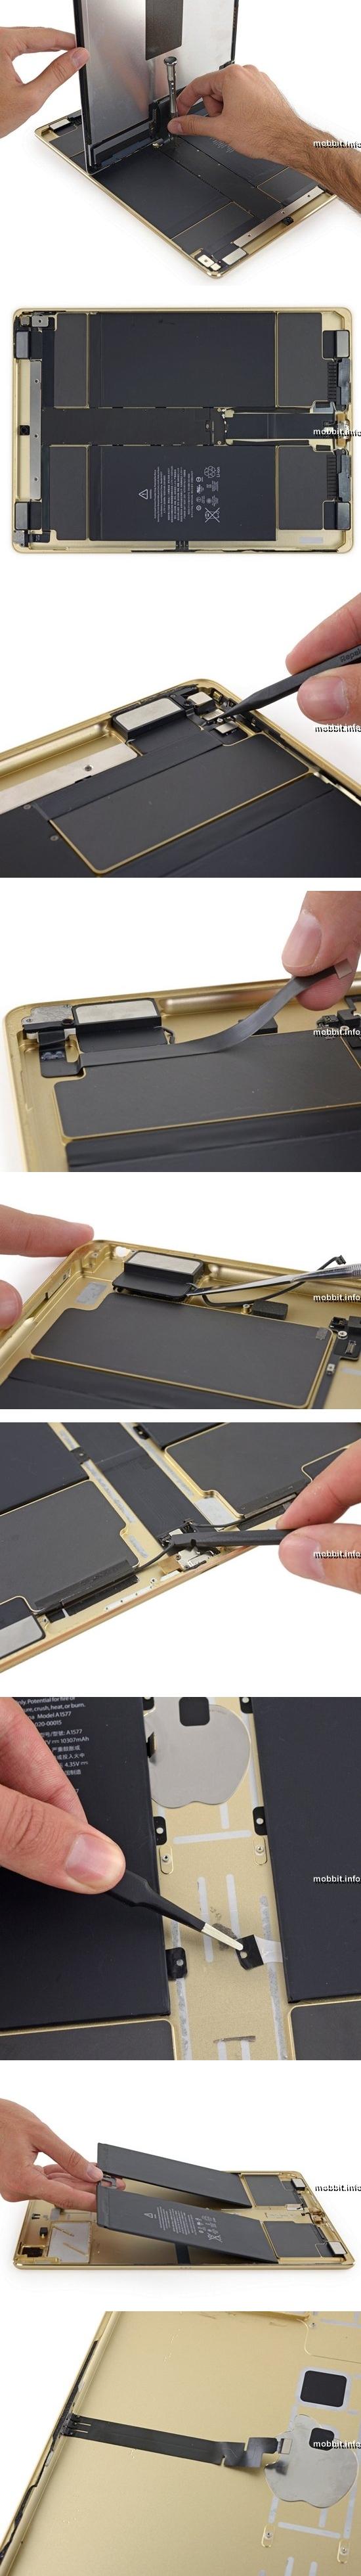 iPad Pro разобран специалистами iFixit